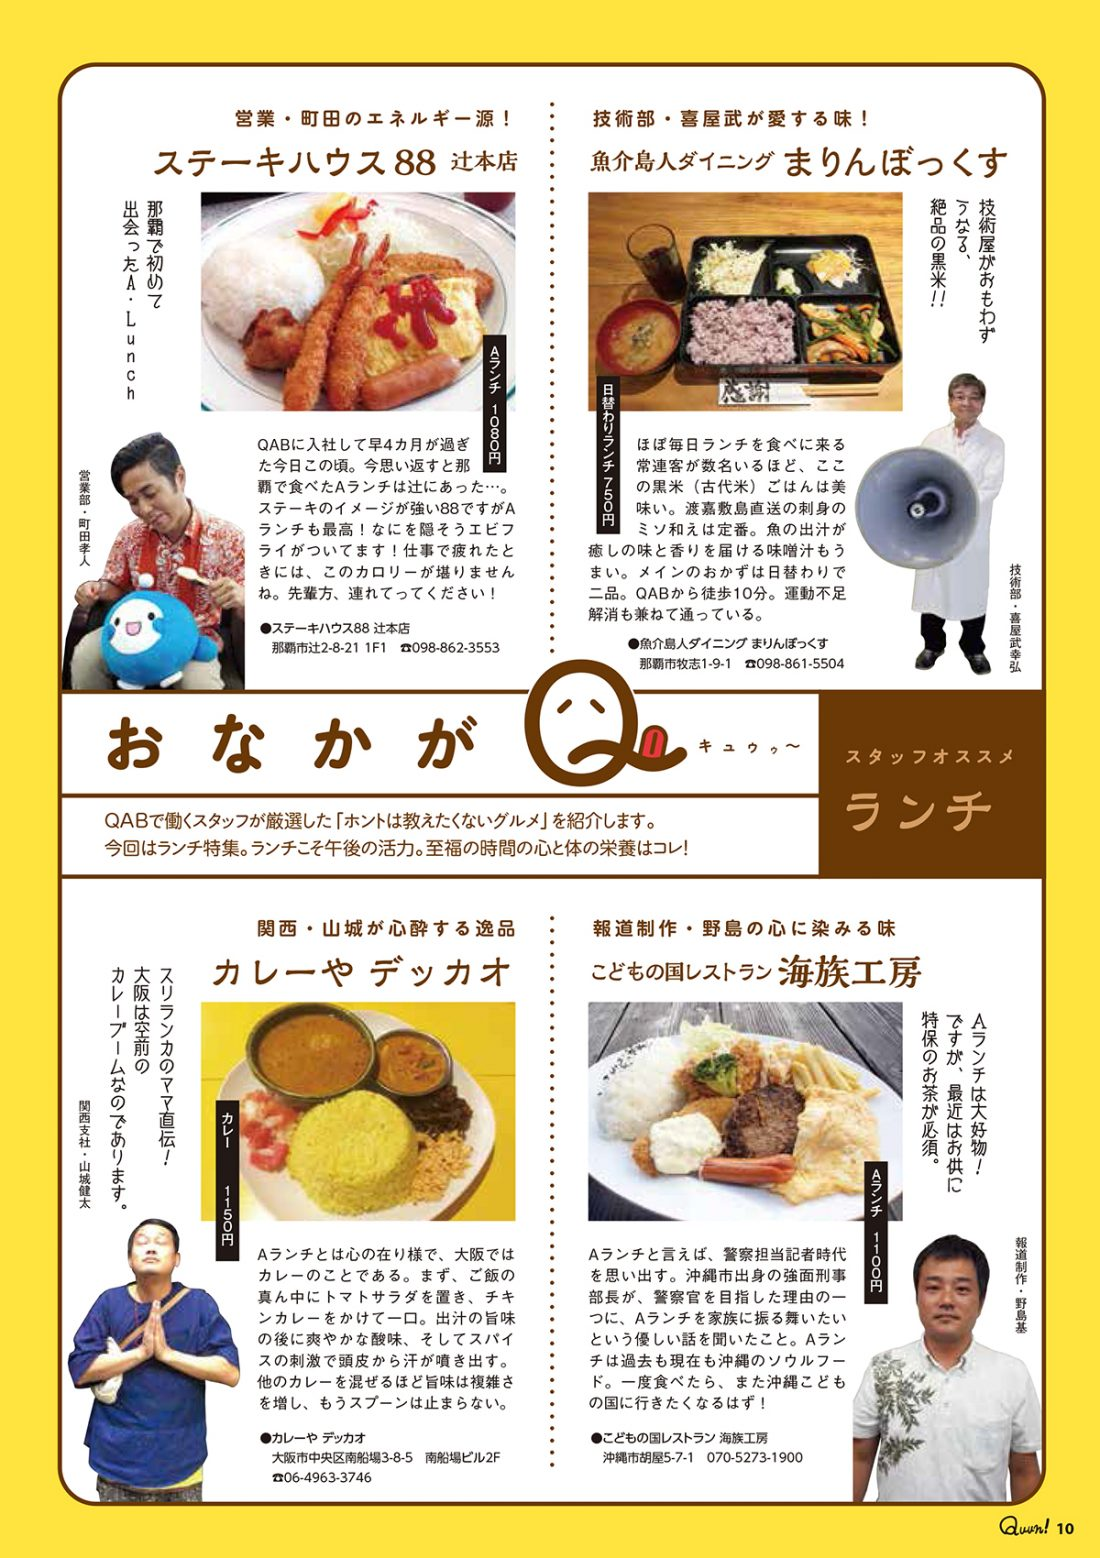 http://www.qab.co.jp/qgoro/wp-content/uploads/quun_0612-1100x1558.jpg